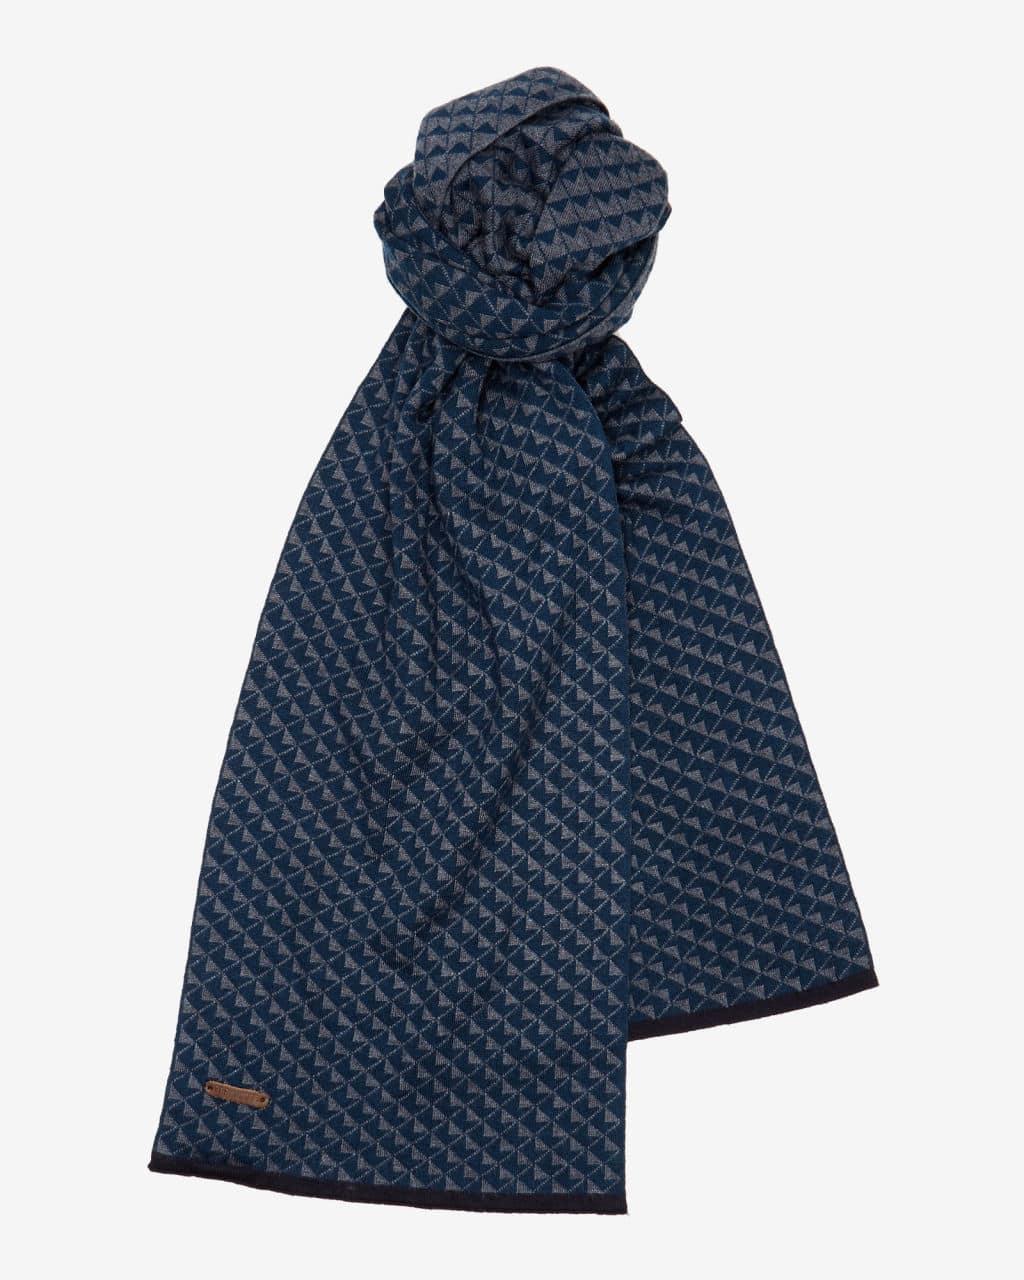 miscarf-square-jacquard-scarf-charcoal_xa6m_miscarf_03-charcoal_1_jpg